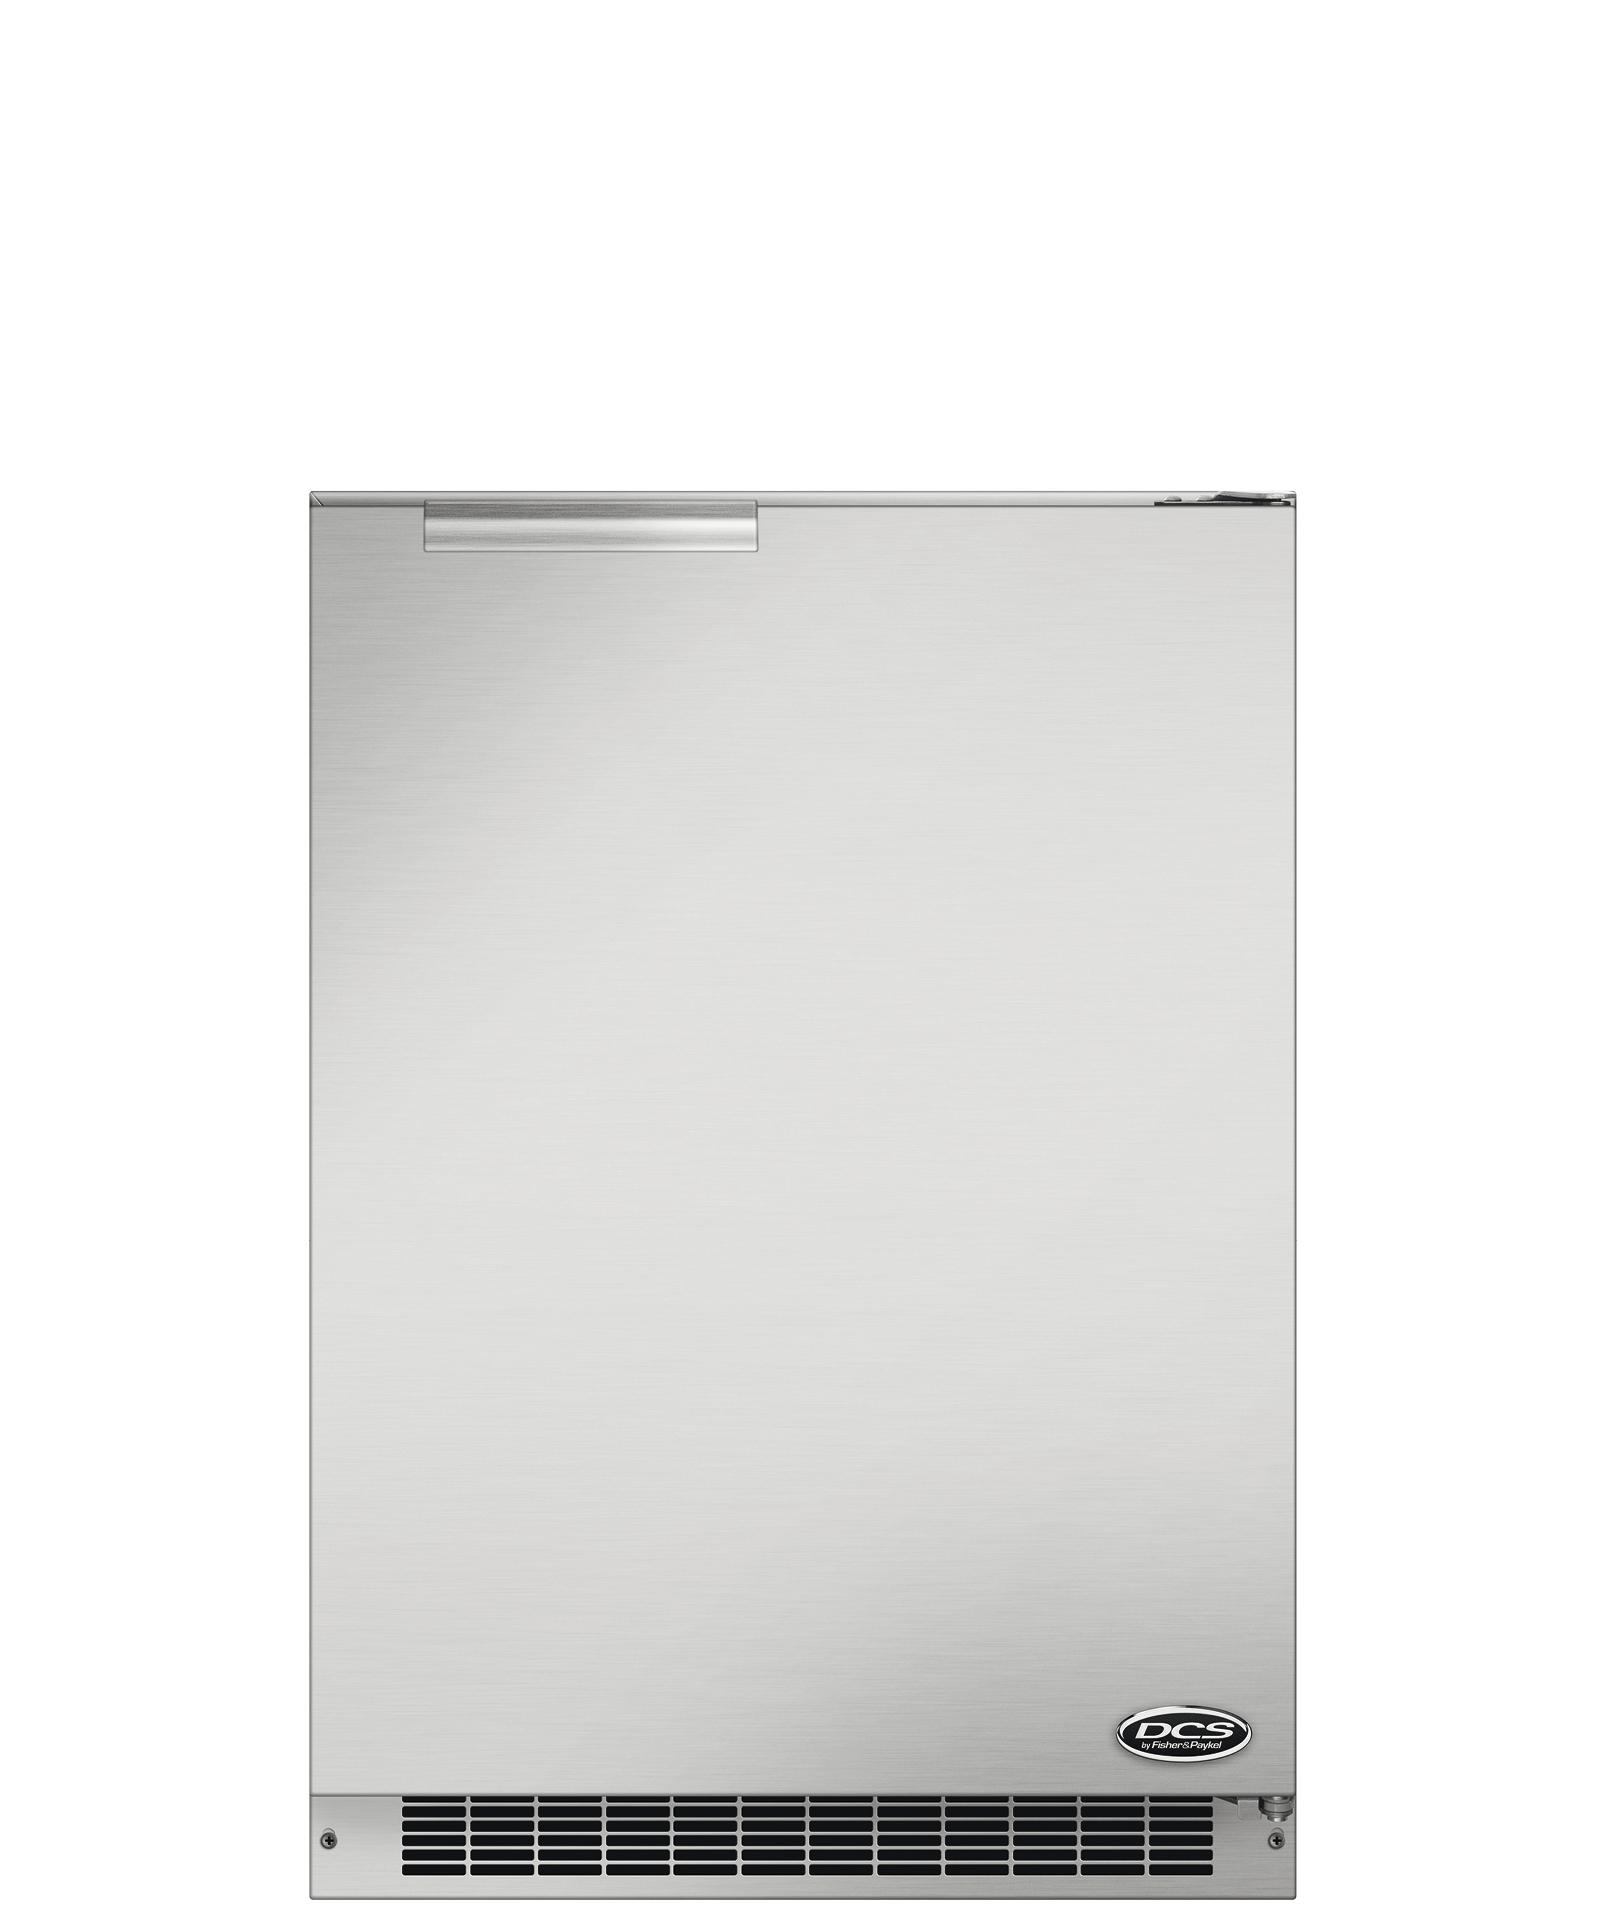 "DCS 24"" Outdoor Refrigerator, Right Hinge"